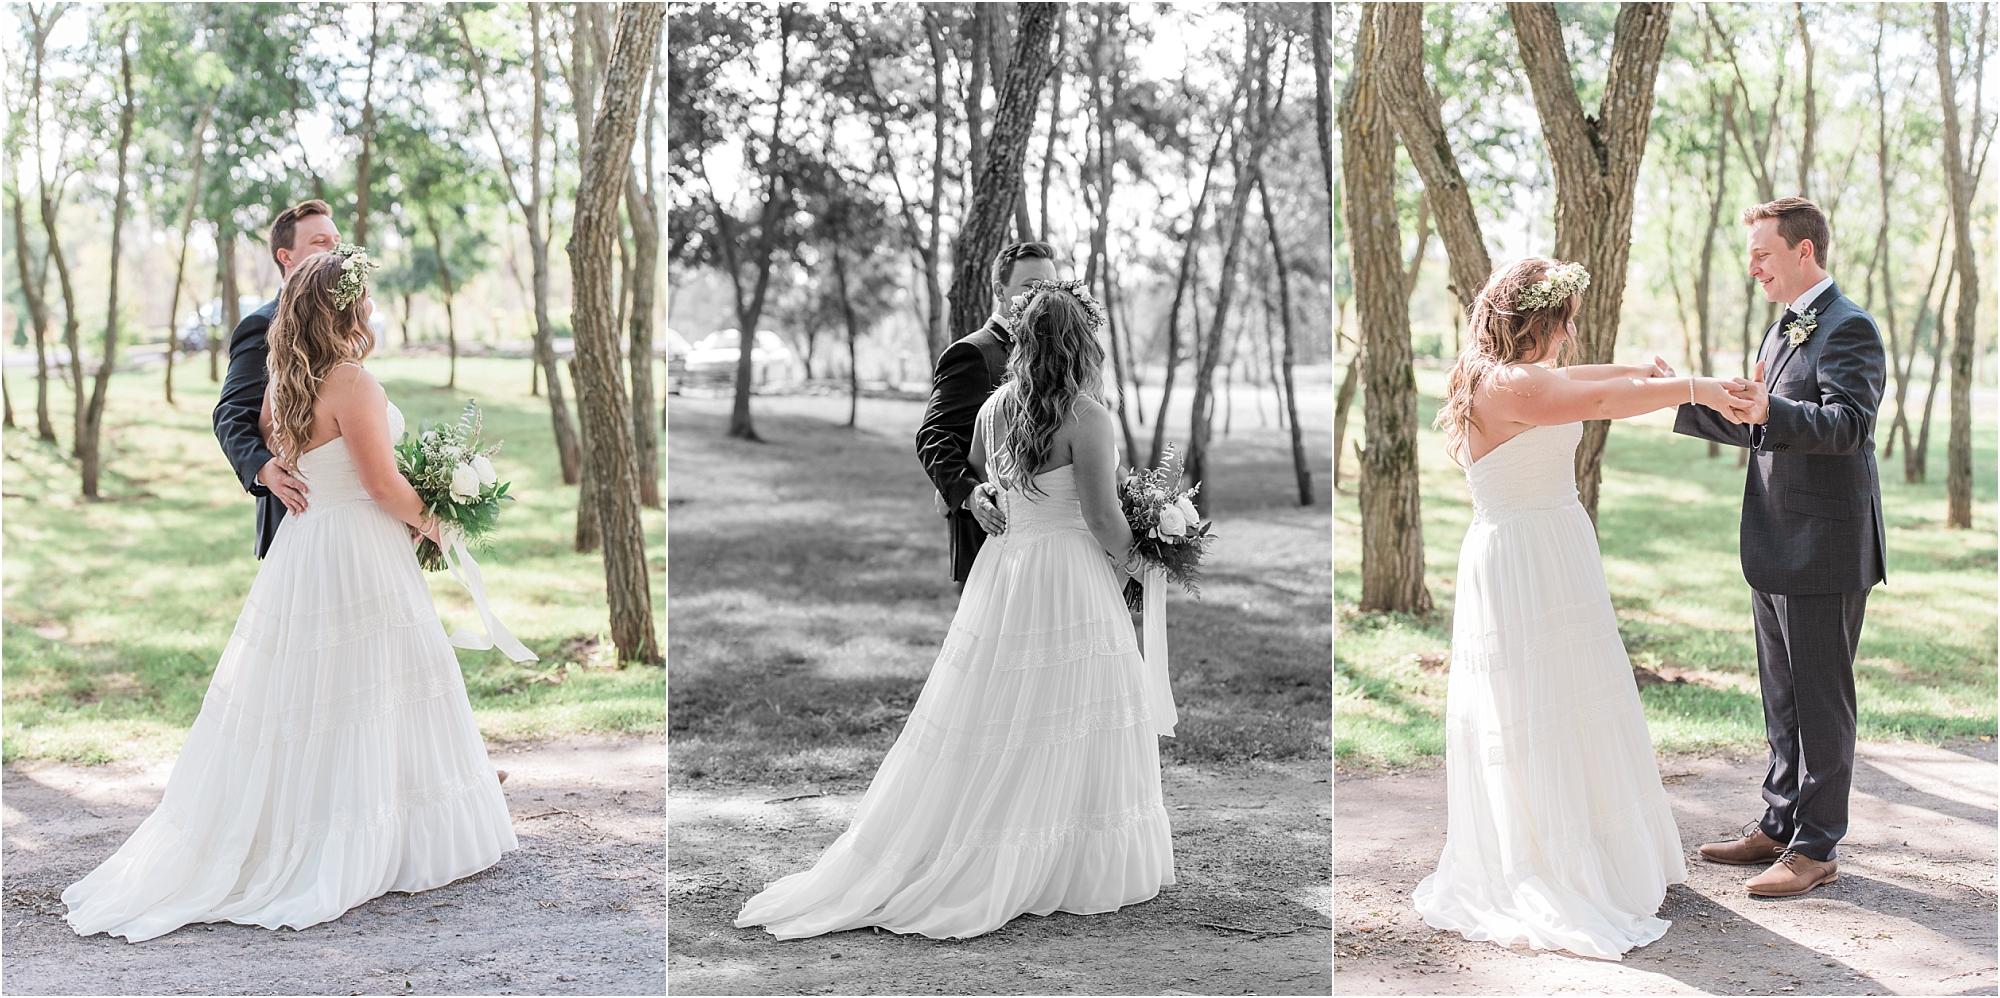 0028 Summer Stonefields Wedding Carleton Place - Ottawa Wedding - Photography by Emma_WEB.jpg